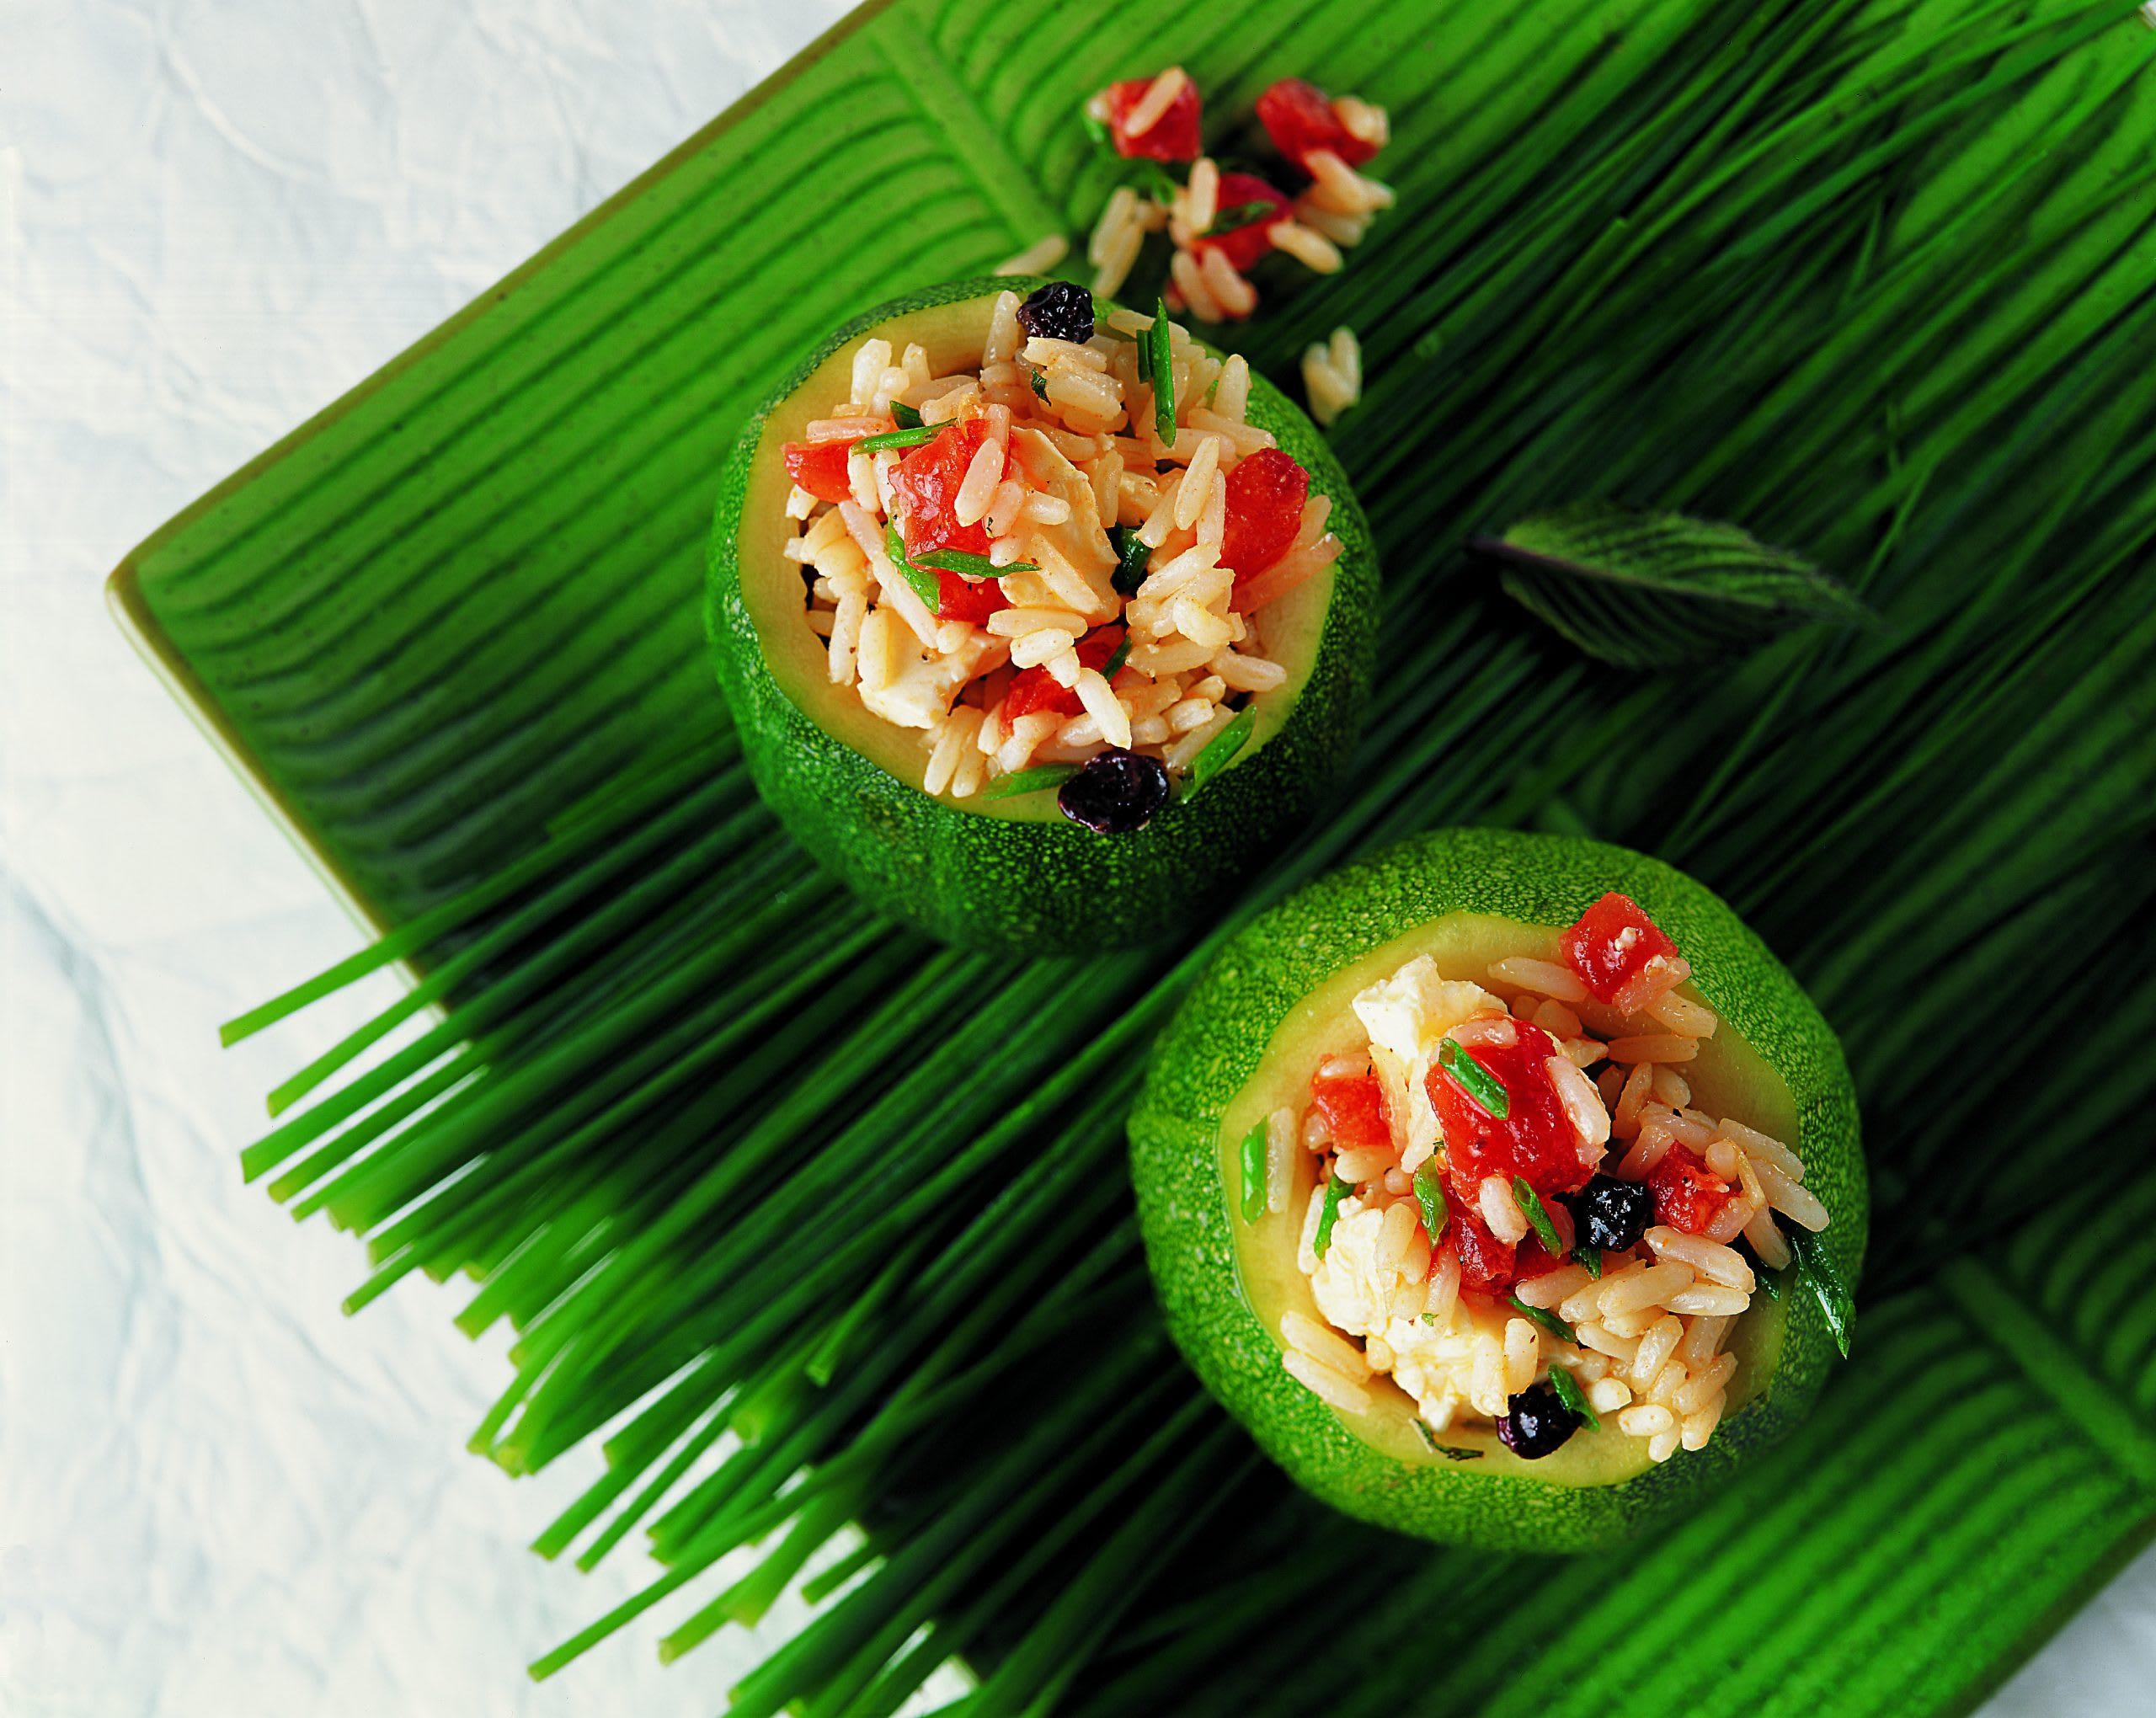 Courgette ronde farcis au riz